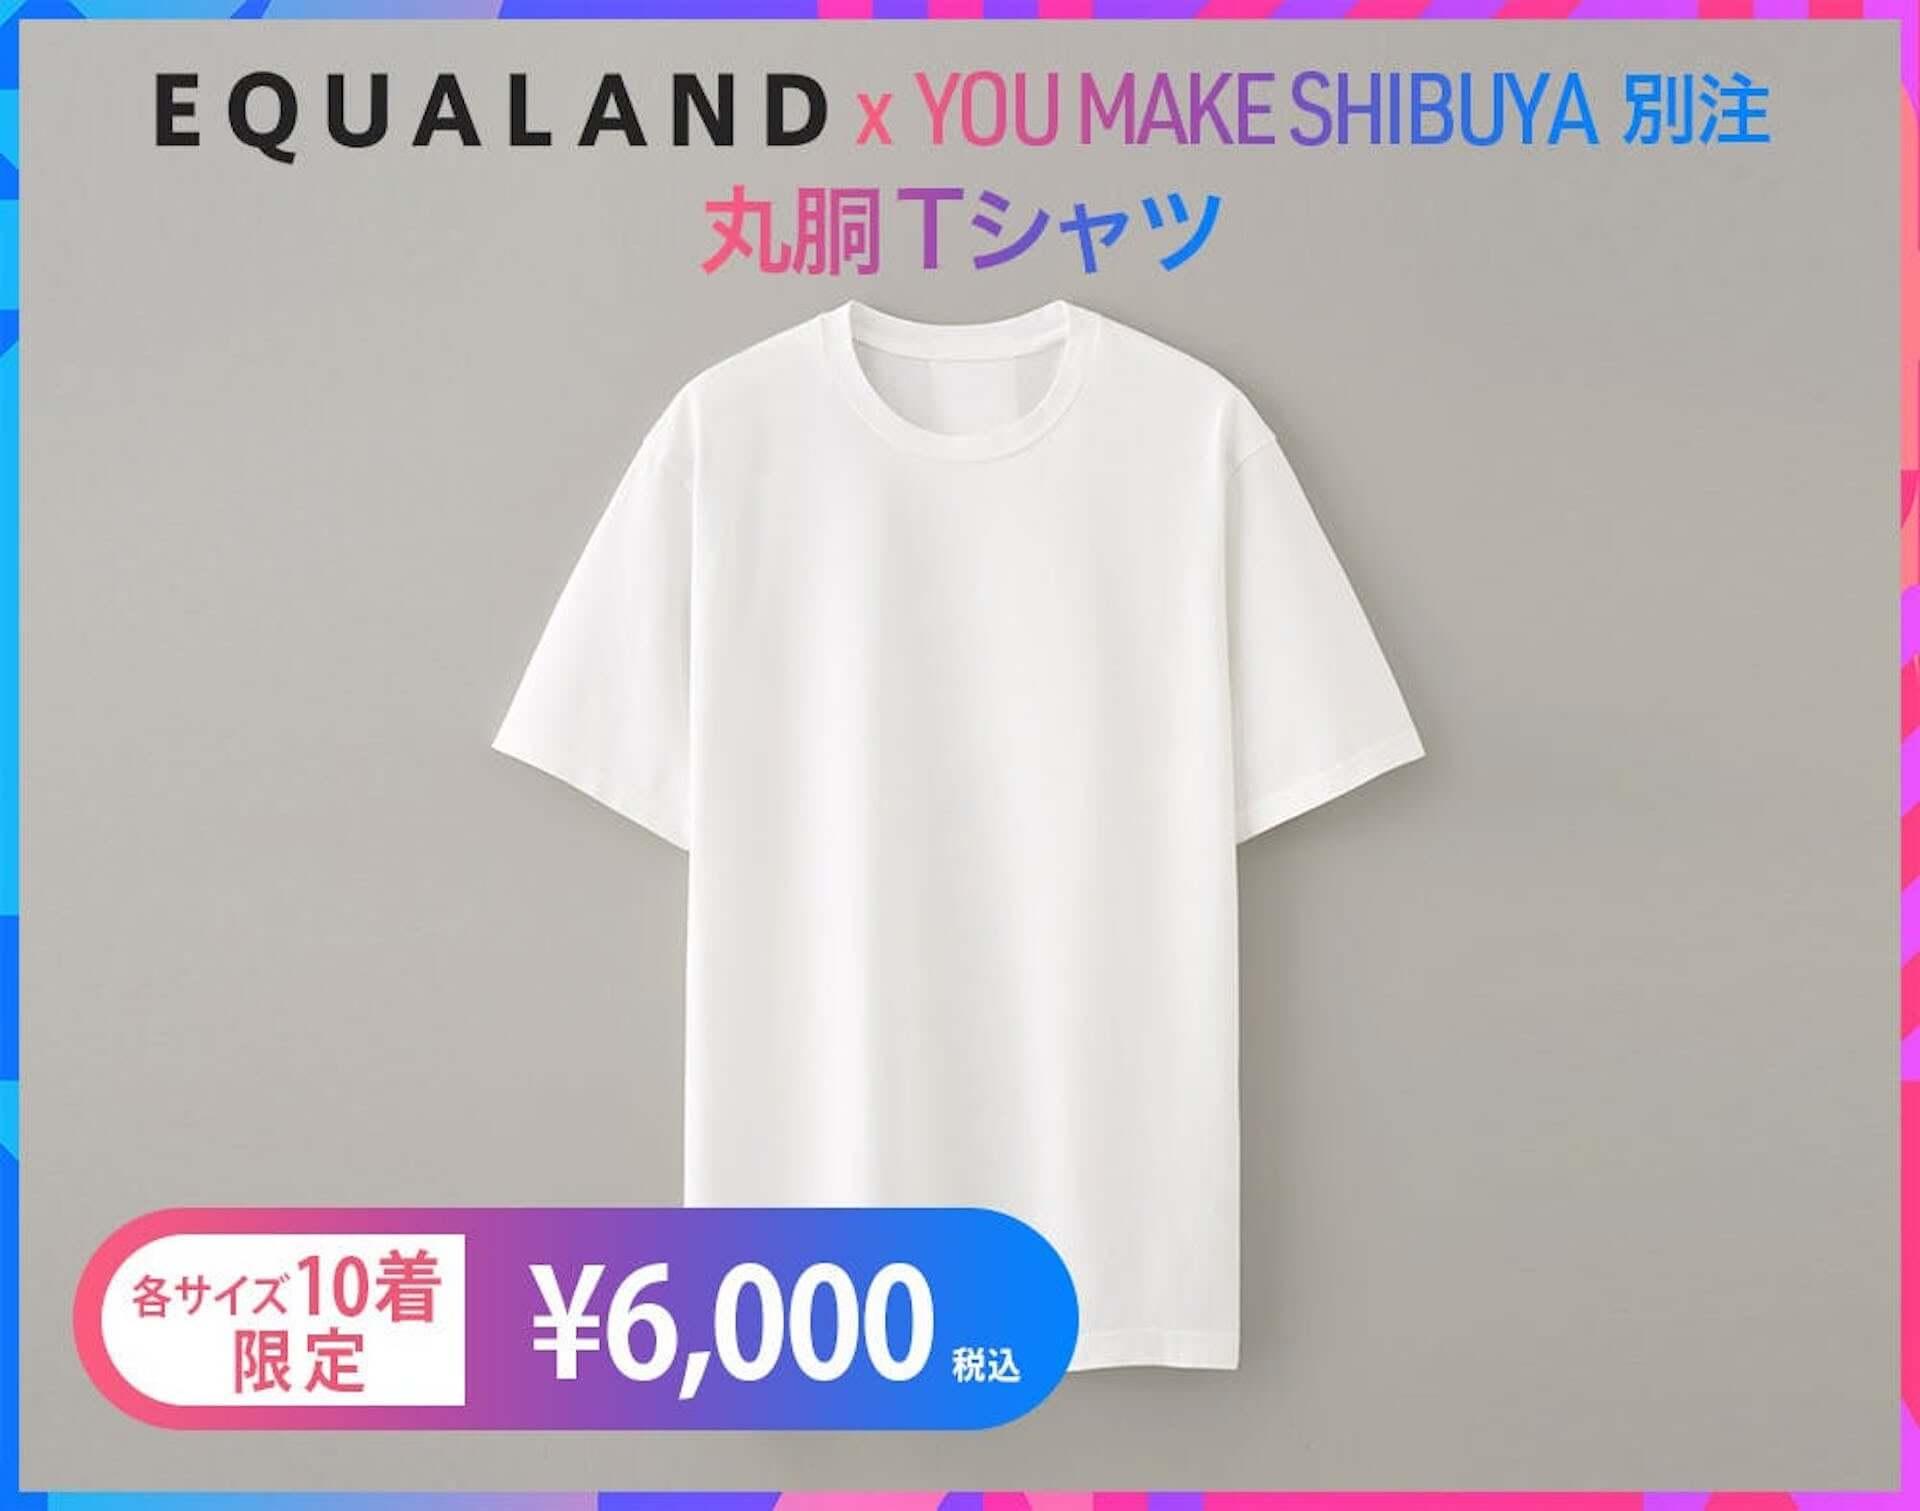 「YOU MAKE SHIBUYA クラウドファンディング」とKISS,TOKYO、atmos、EQUALAND、FR2がコラボ!リターンにTシャツ、フーディーなど多数登場 lf200805_youmakeshibuya_5-1920x1511